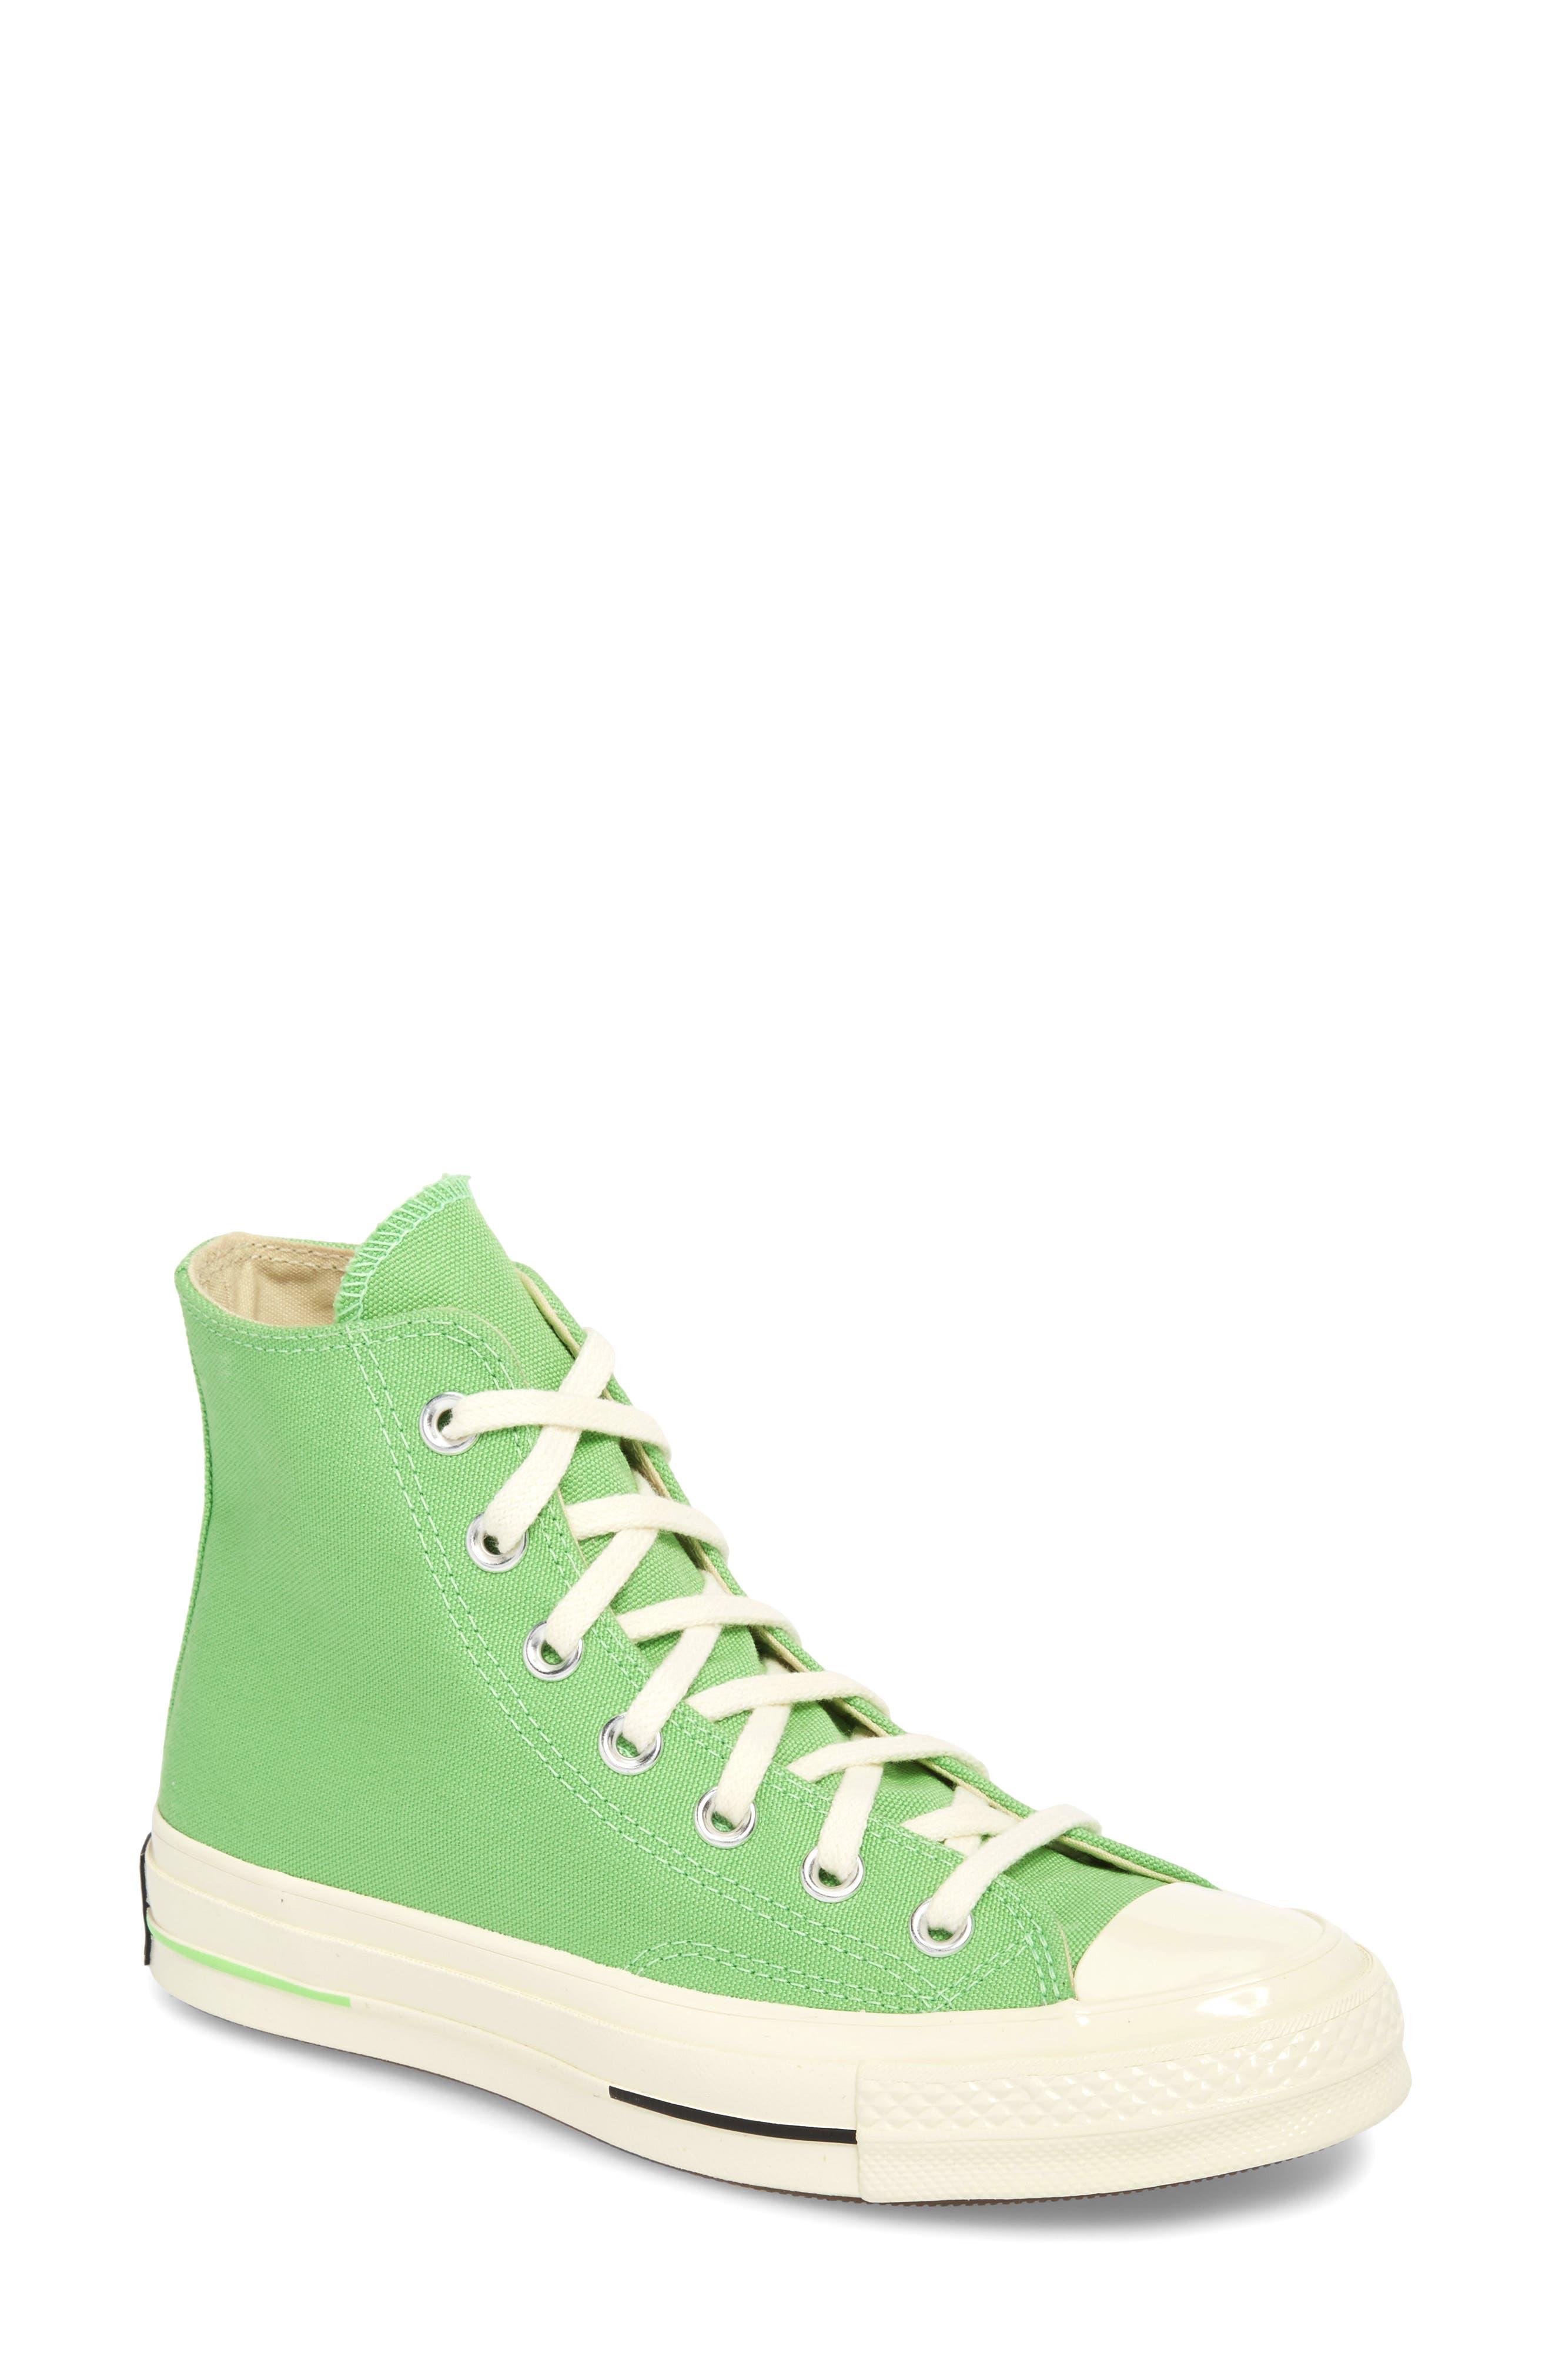 Chuck Taylor<sup>®</sup> All Star<sup>®</sup> 70 Brights High Top Sneaker,                             Main thumbnail 1, color,                             336